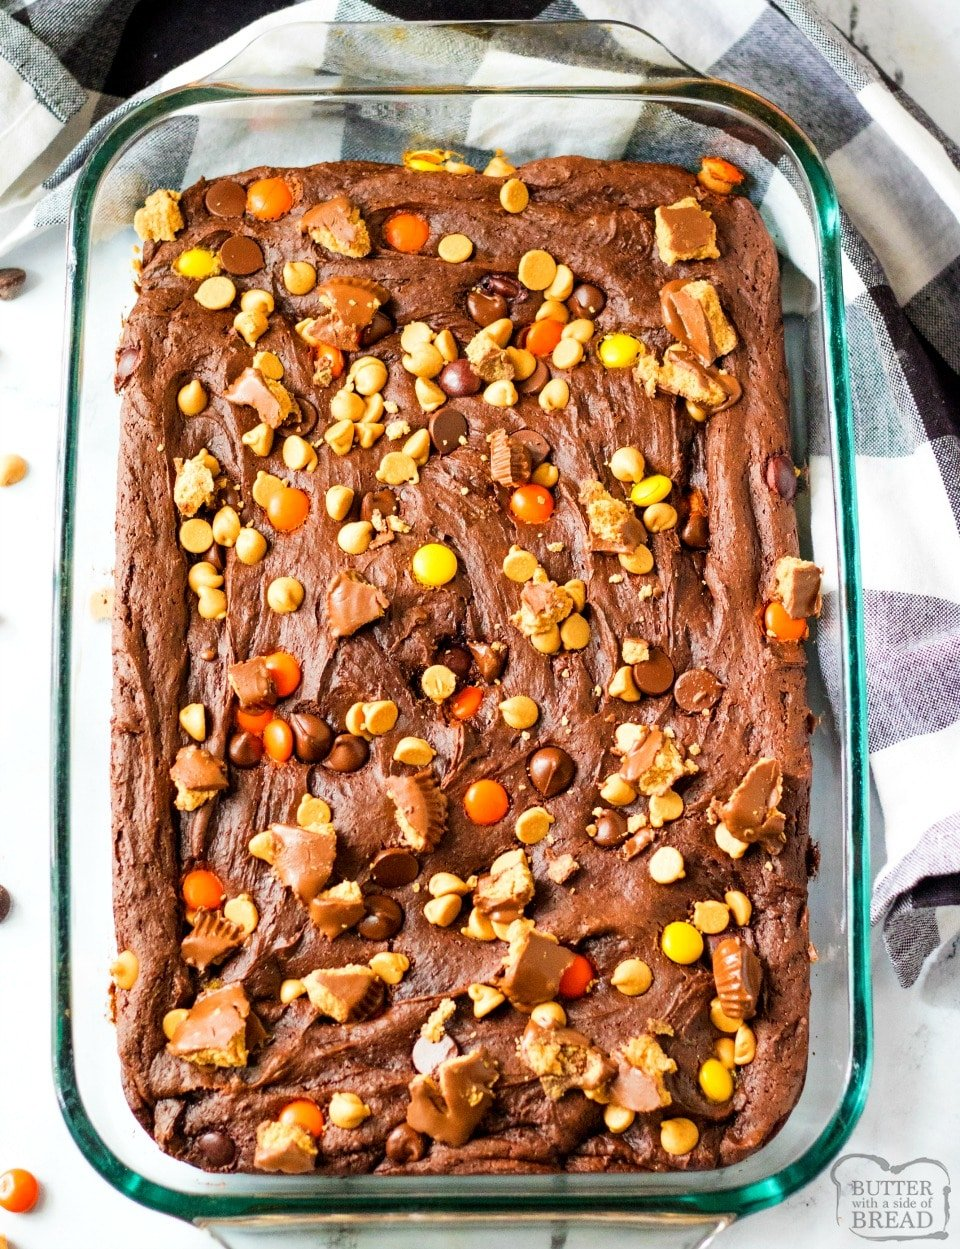 Easy Reese's Chocolate Dump cake recipe